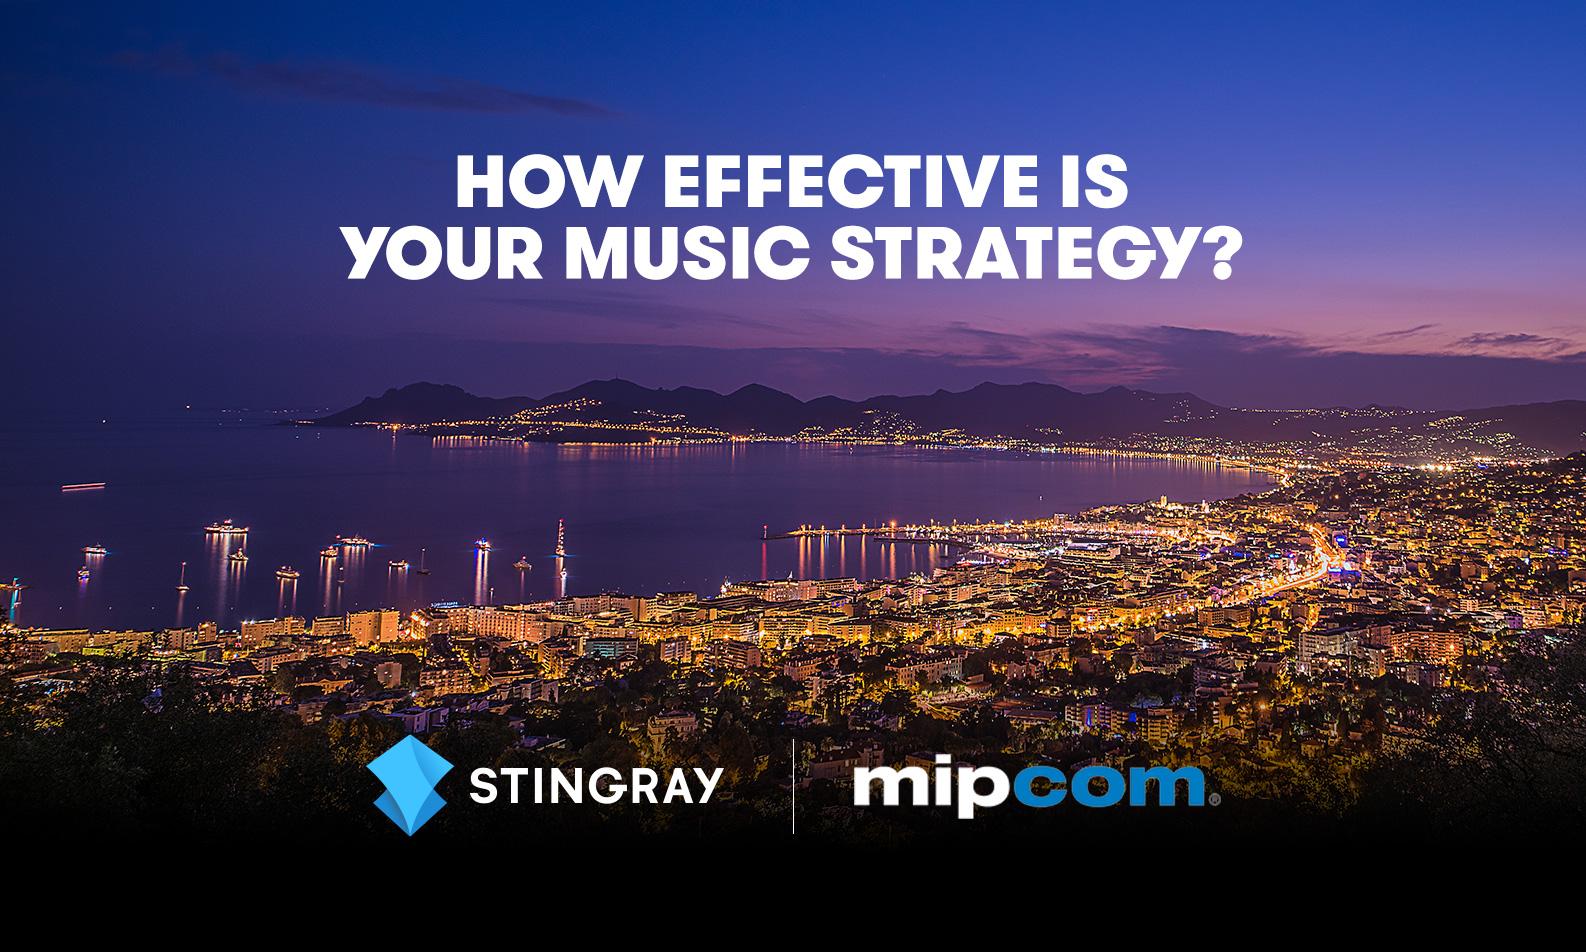 Meet Stingray at MIPCOM 2017